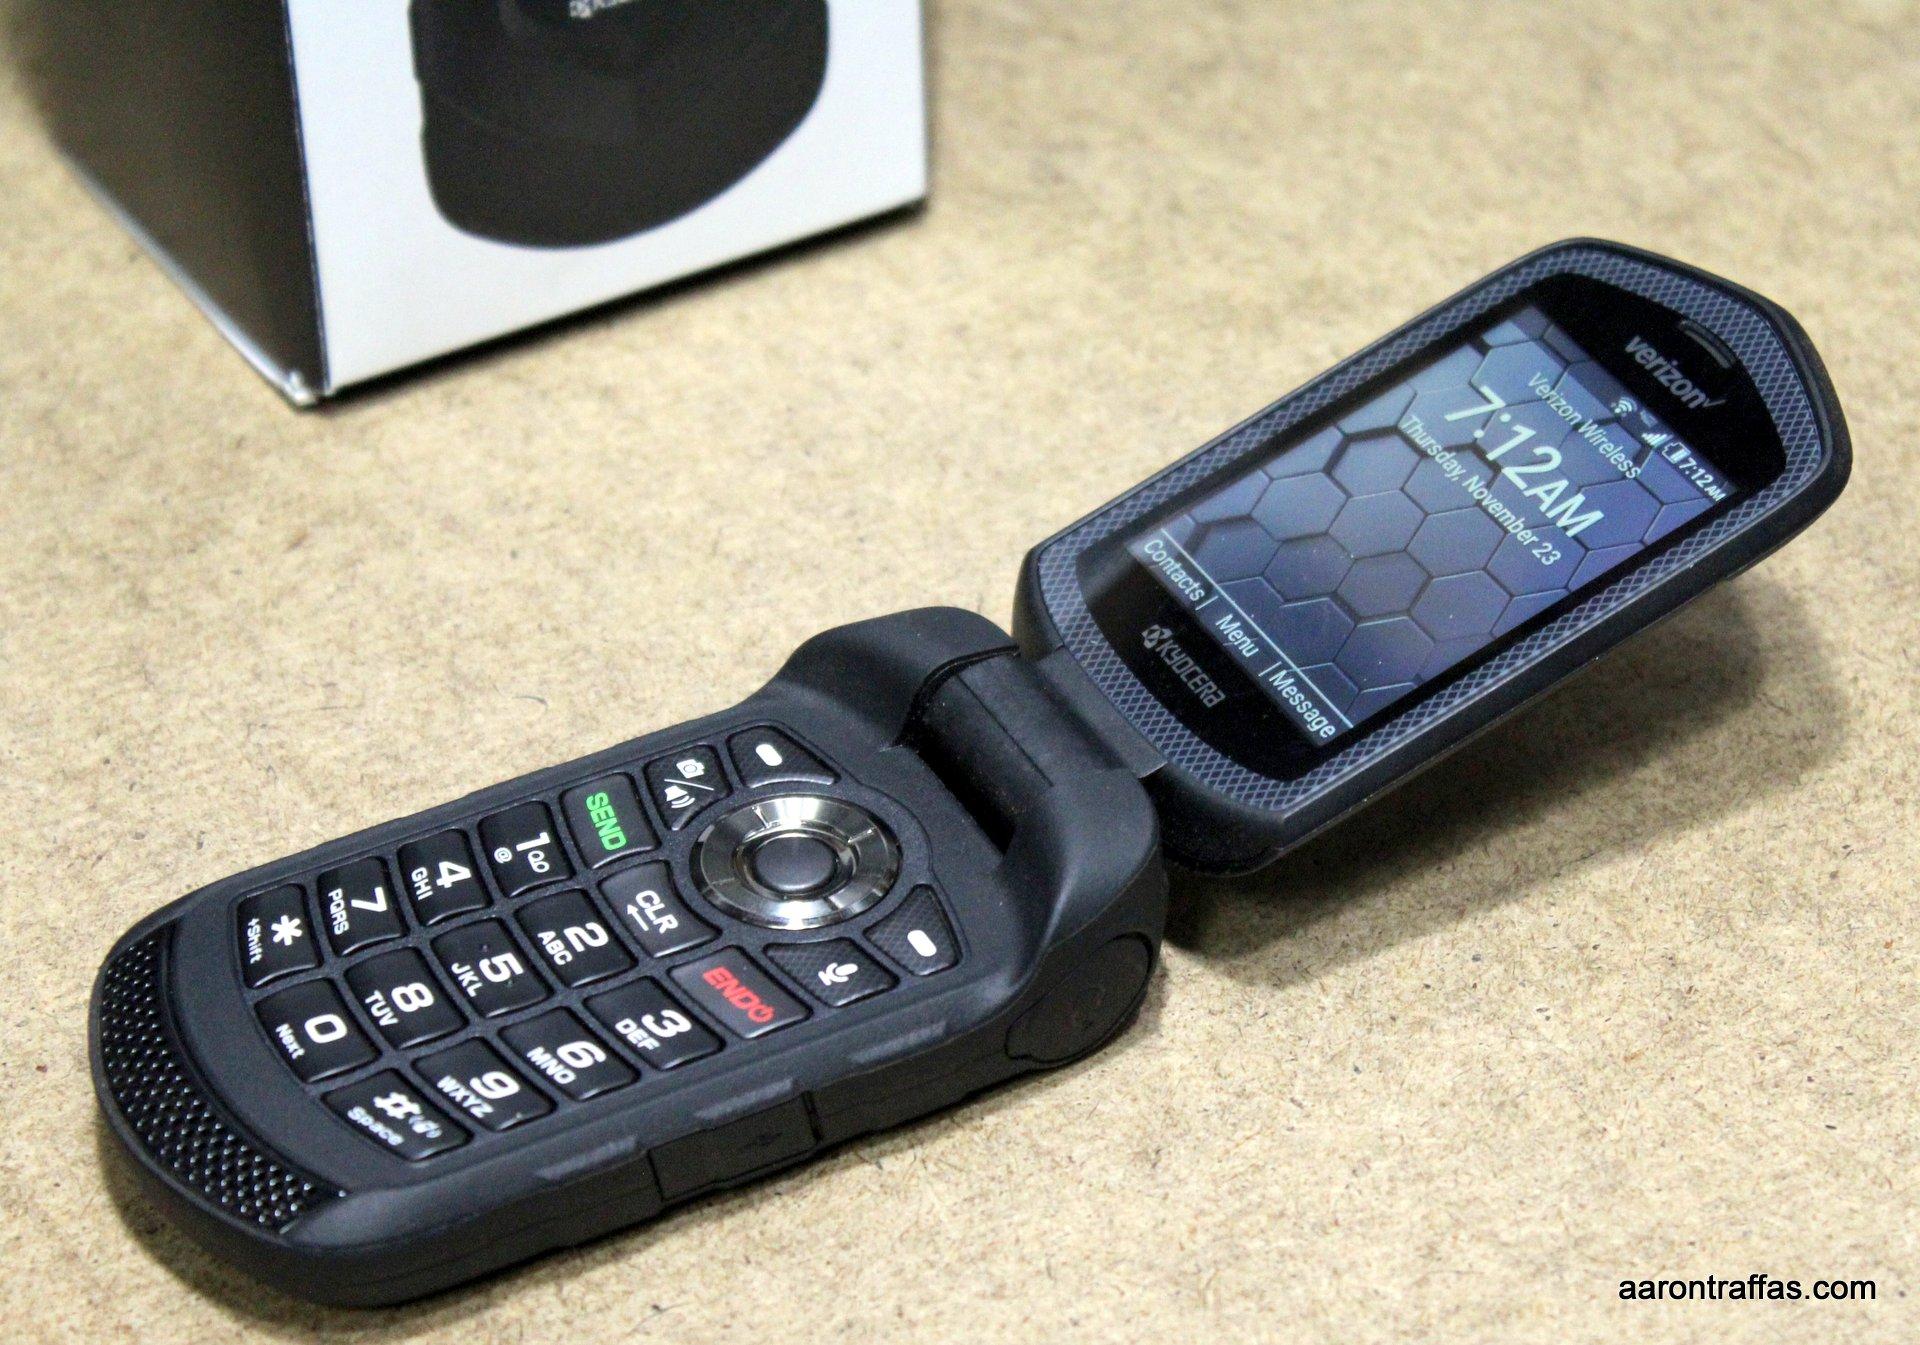 My Verizon Home Phone